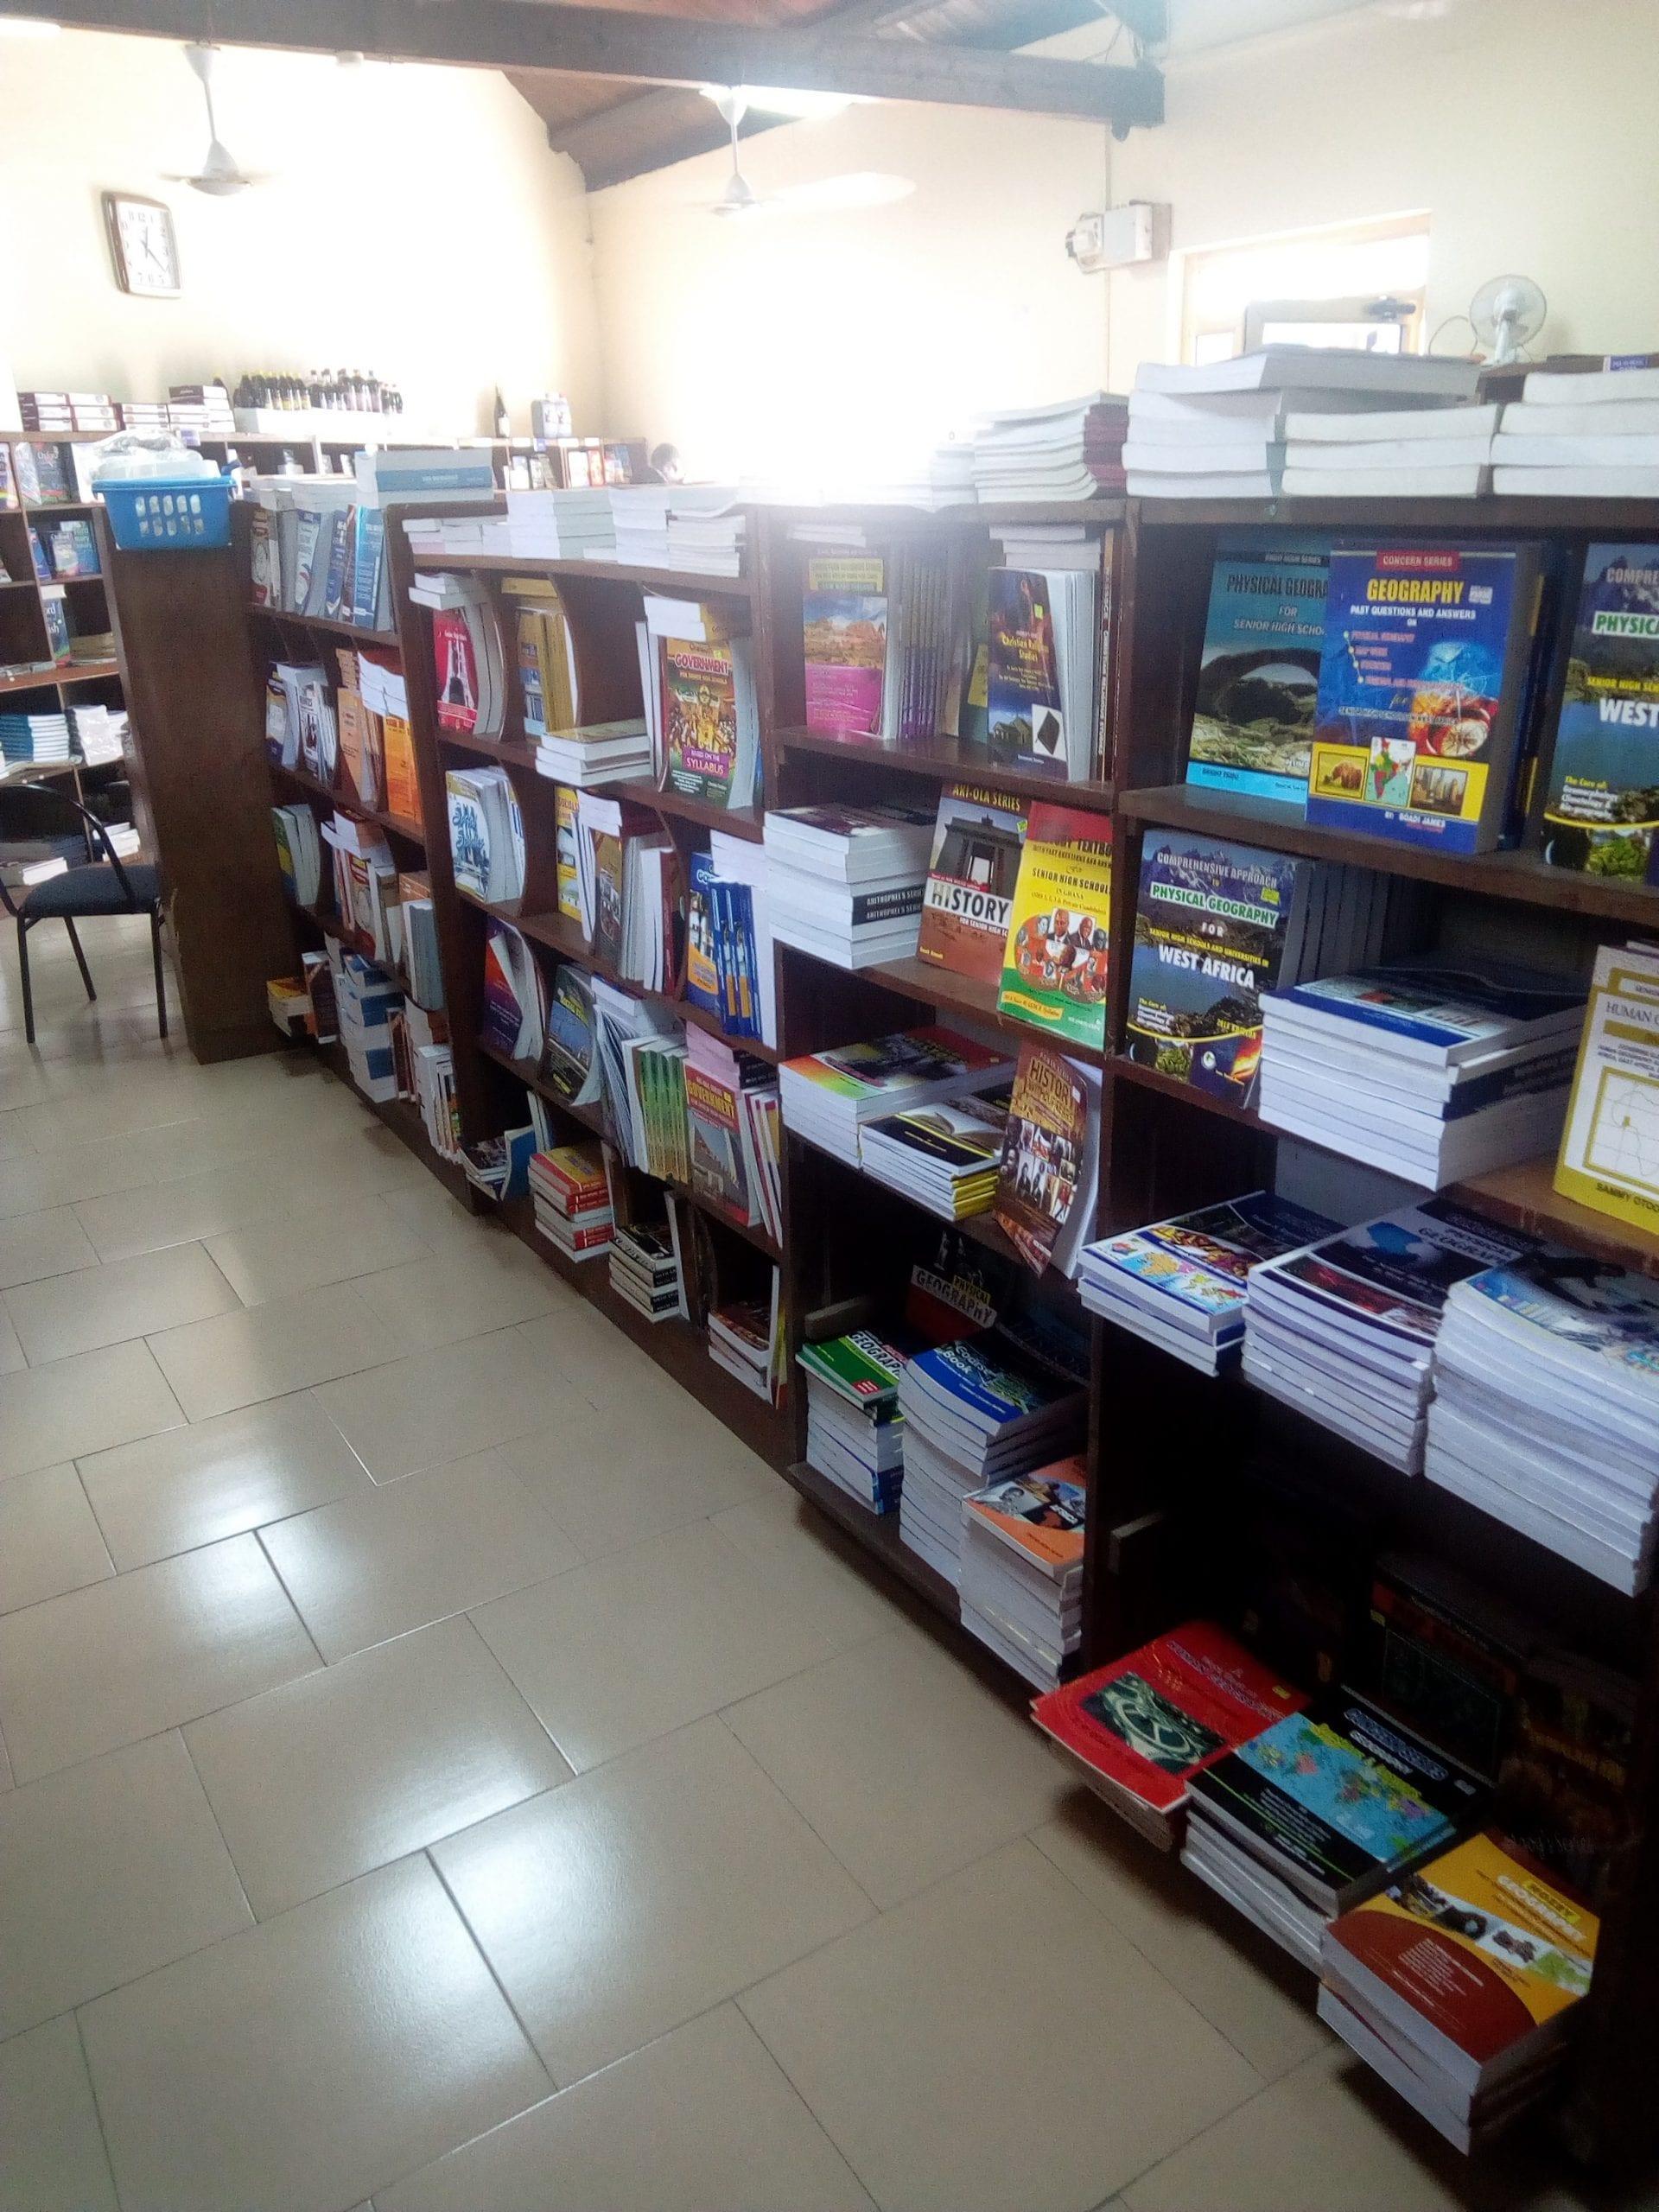 Methodist Book Depot bookstores in Accra Ghana